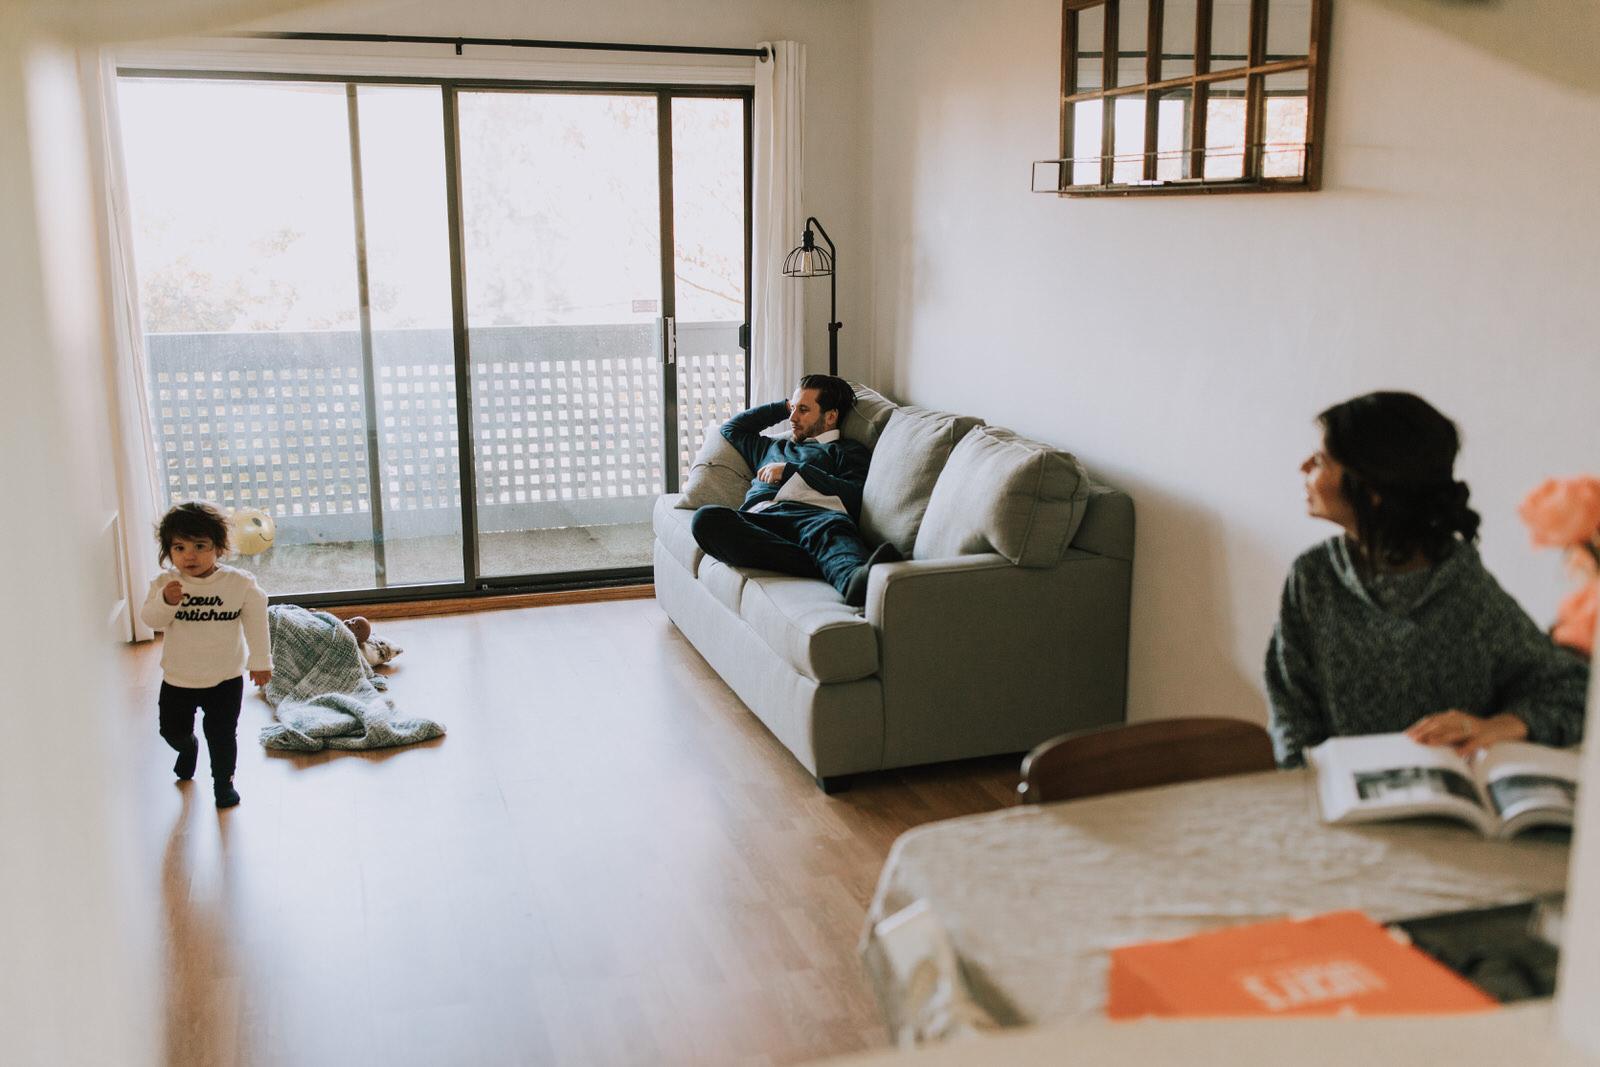 family-session-the-jupps-vancouver-photographer-iamjohnyoo-11.JPG